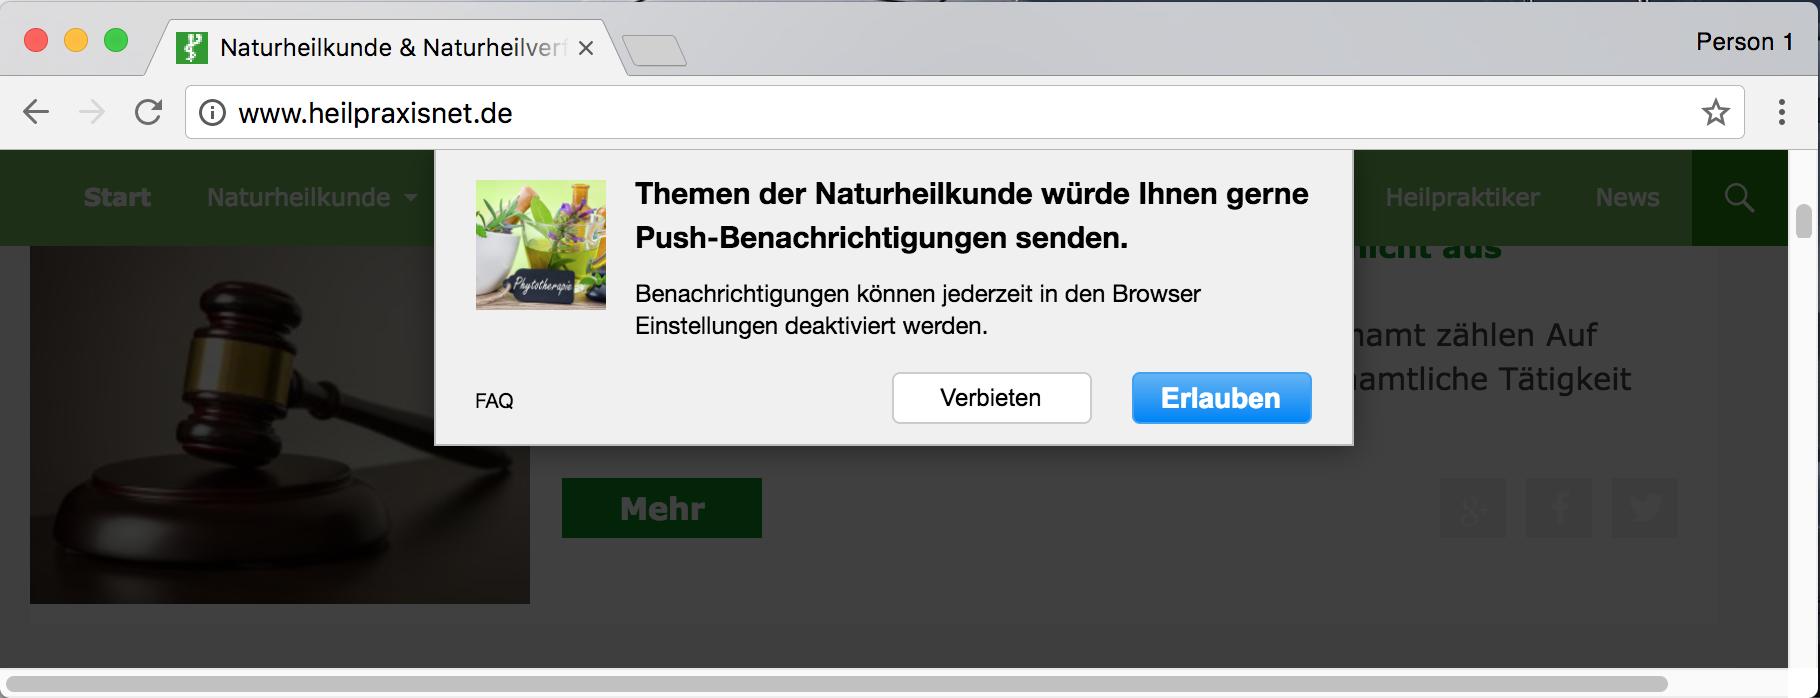 Heilpraxisnet Push Nachrichten Opt-In